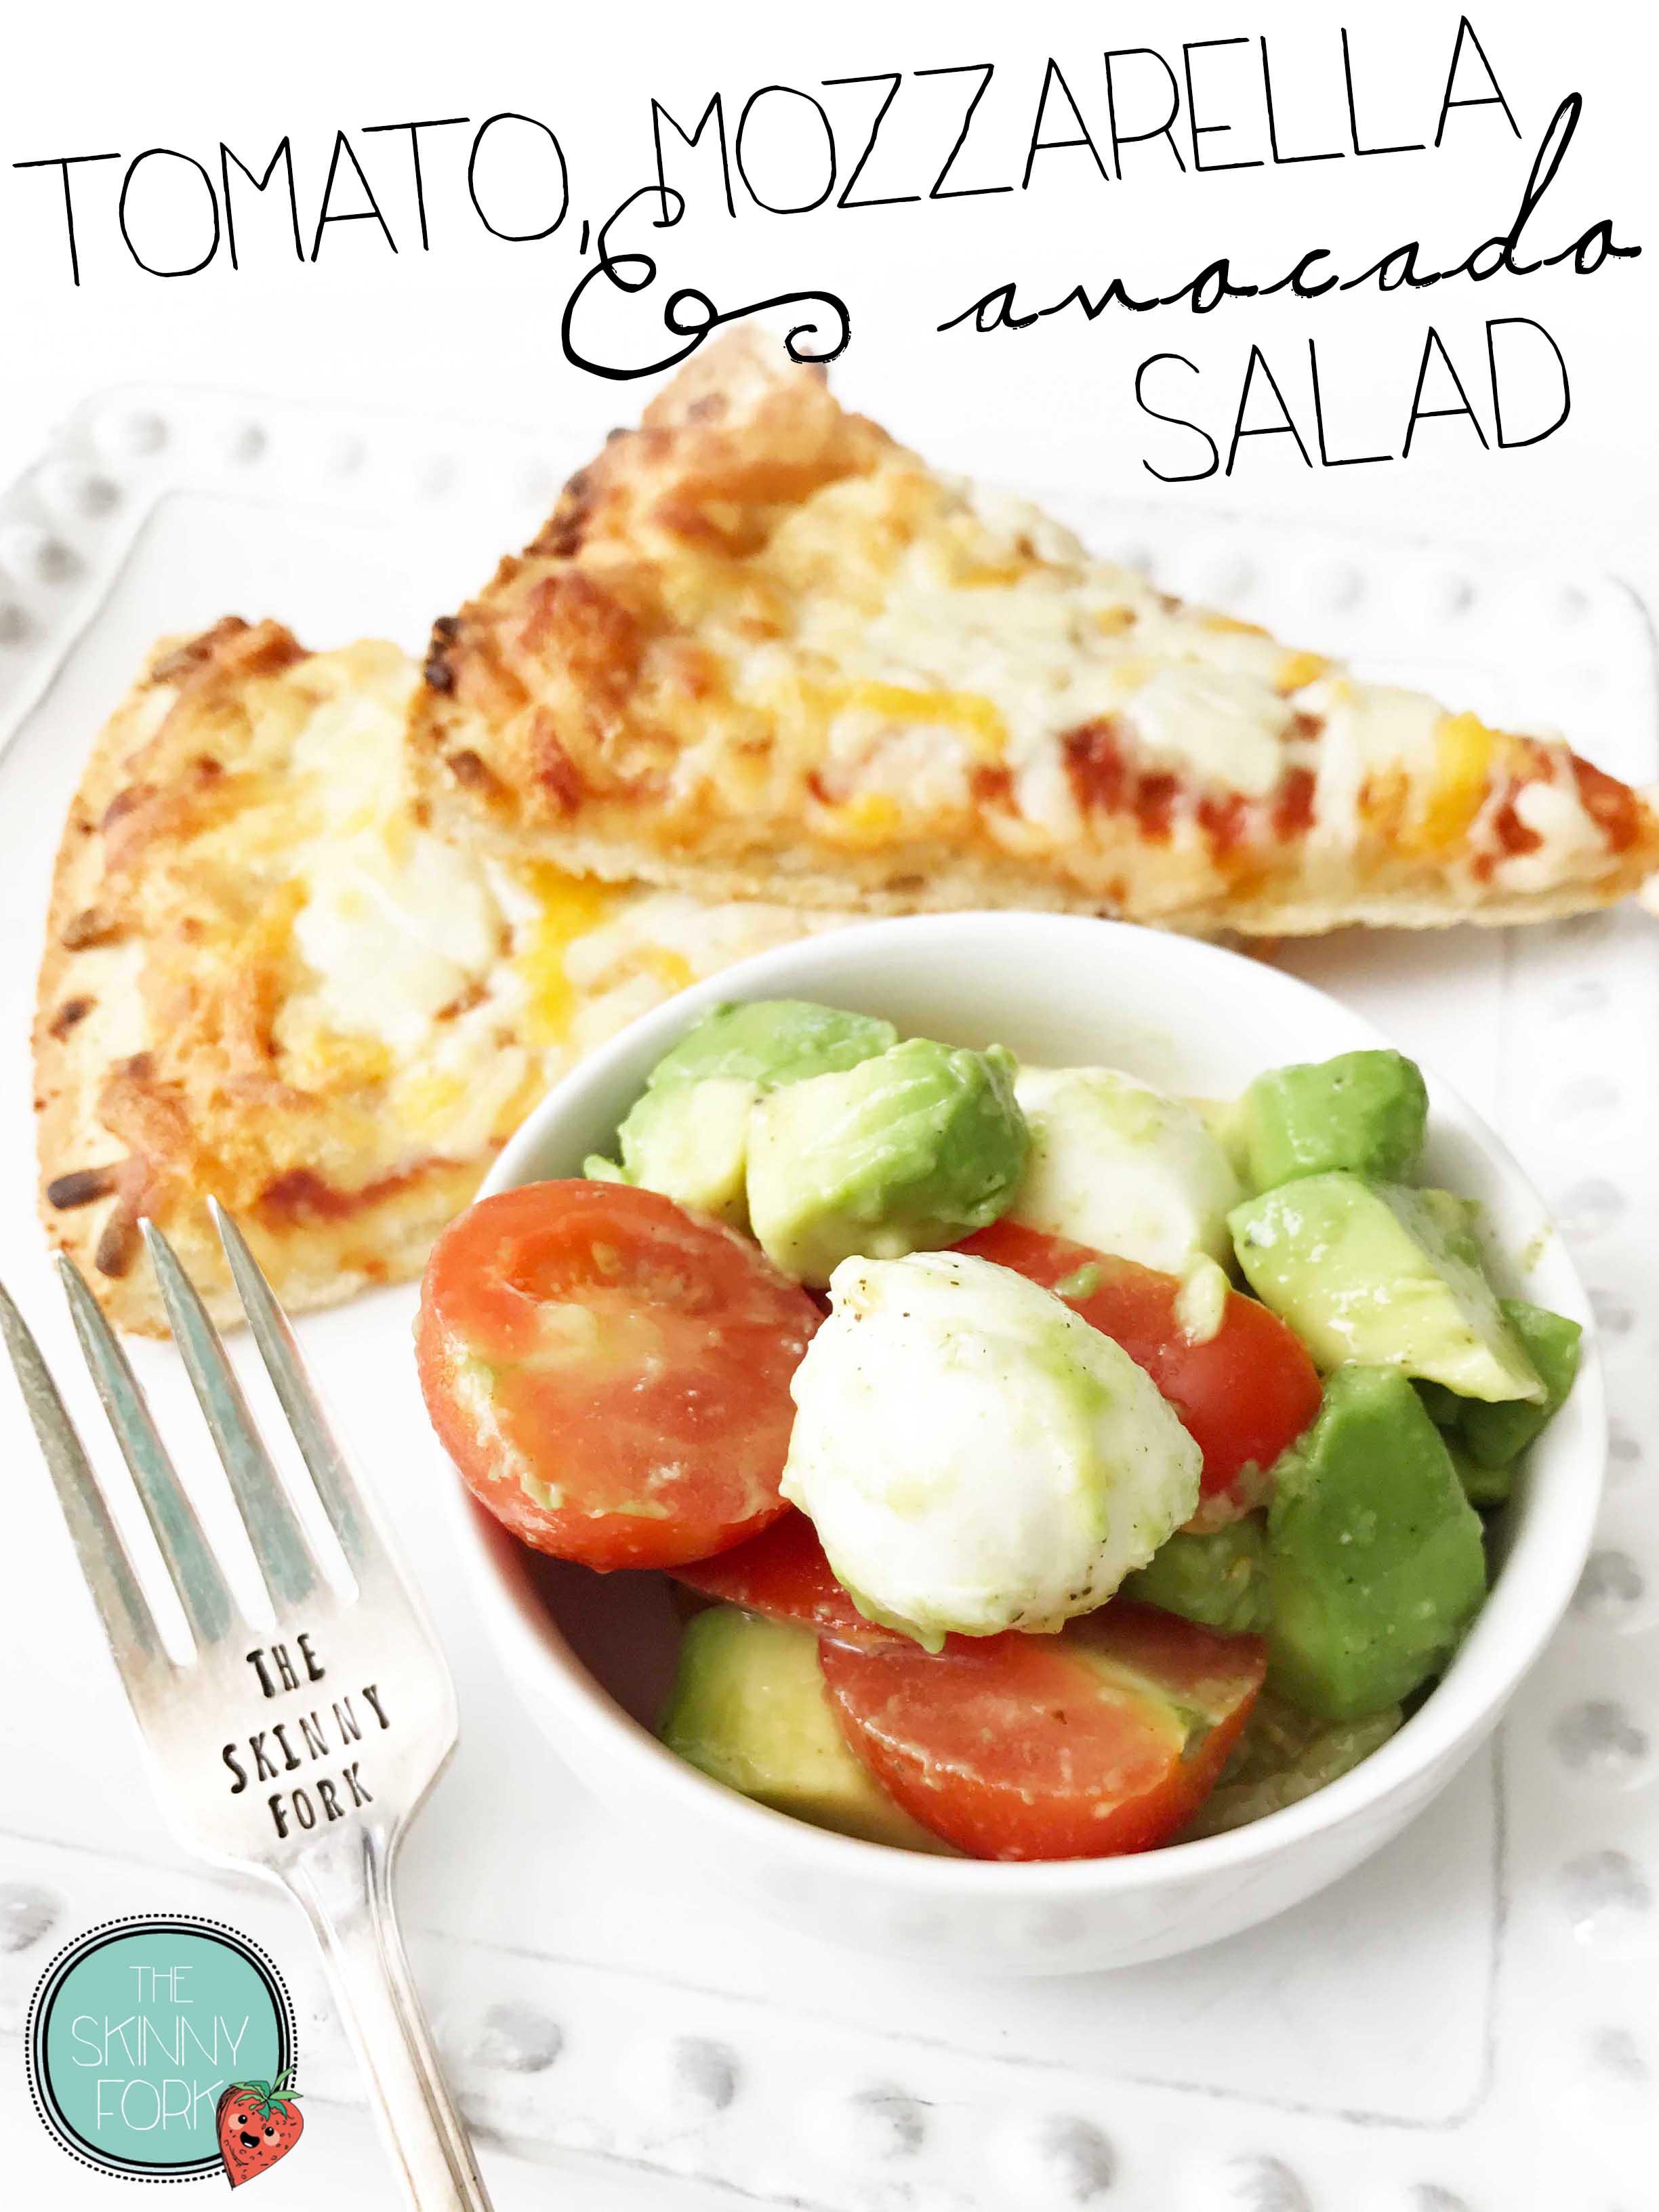 tomato-mozz-avo-pin.jpg